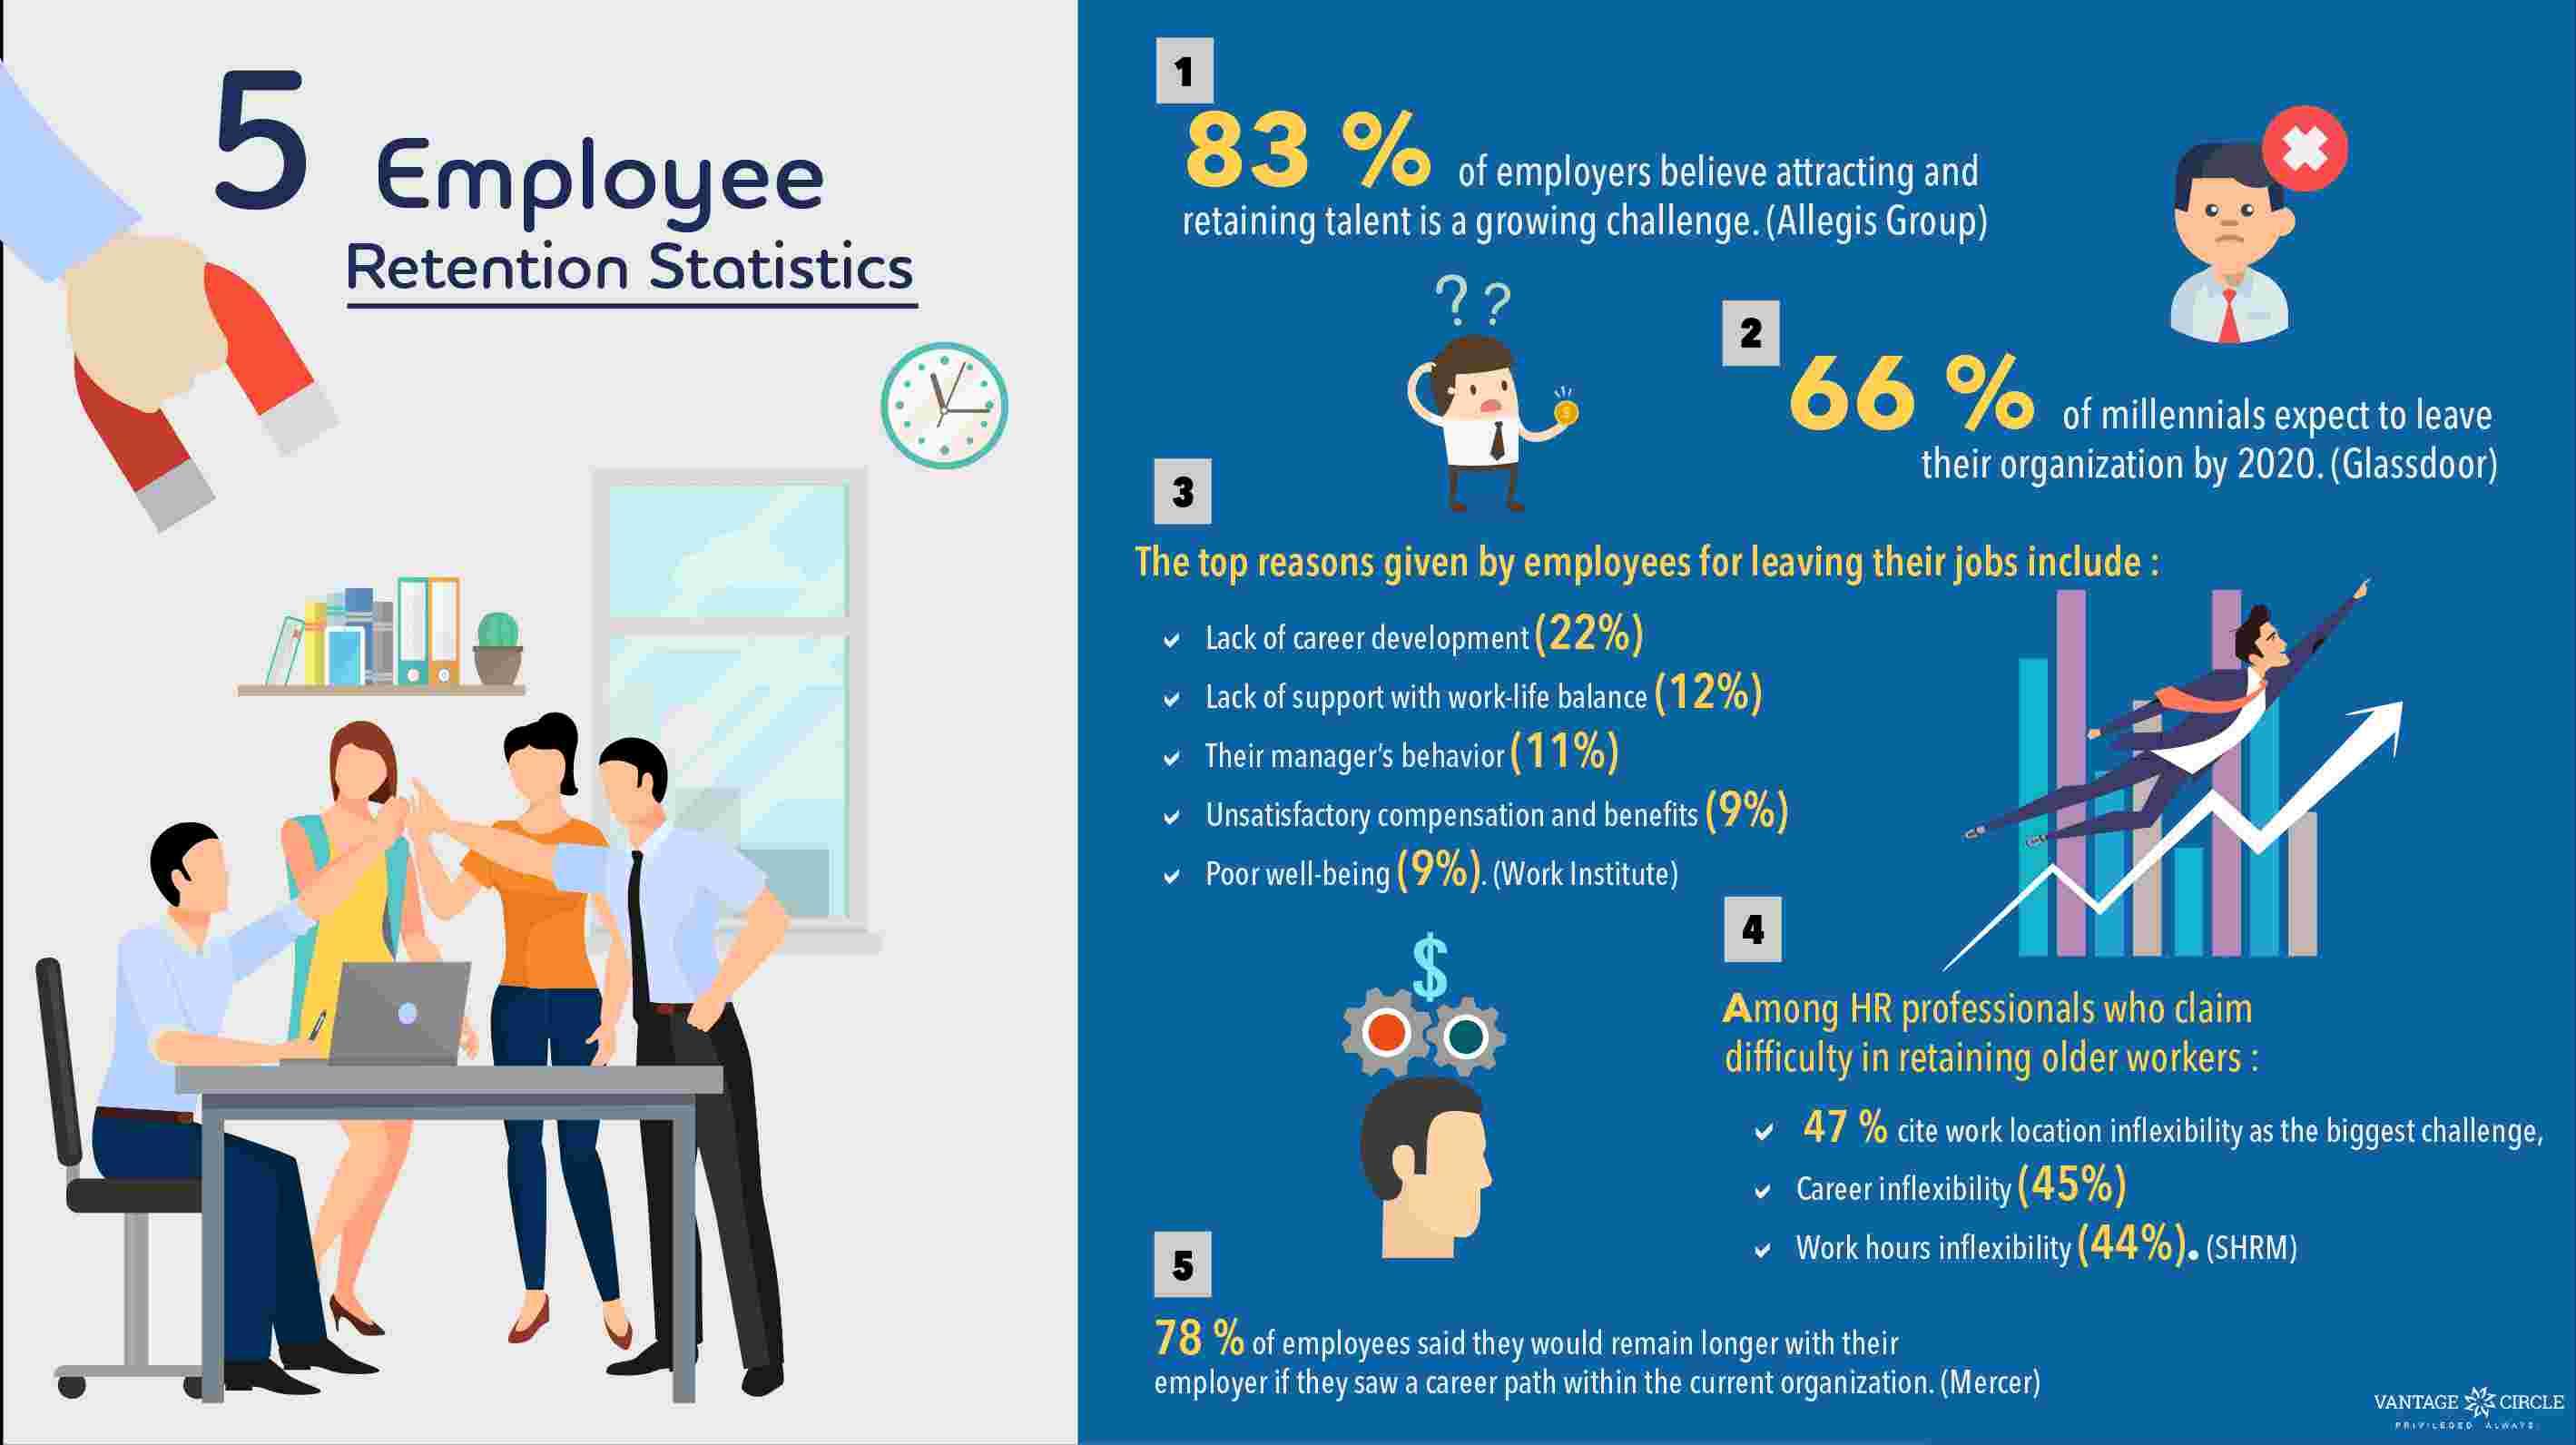 Employee-retention-factors-infographic-2